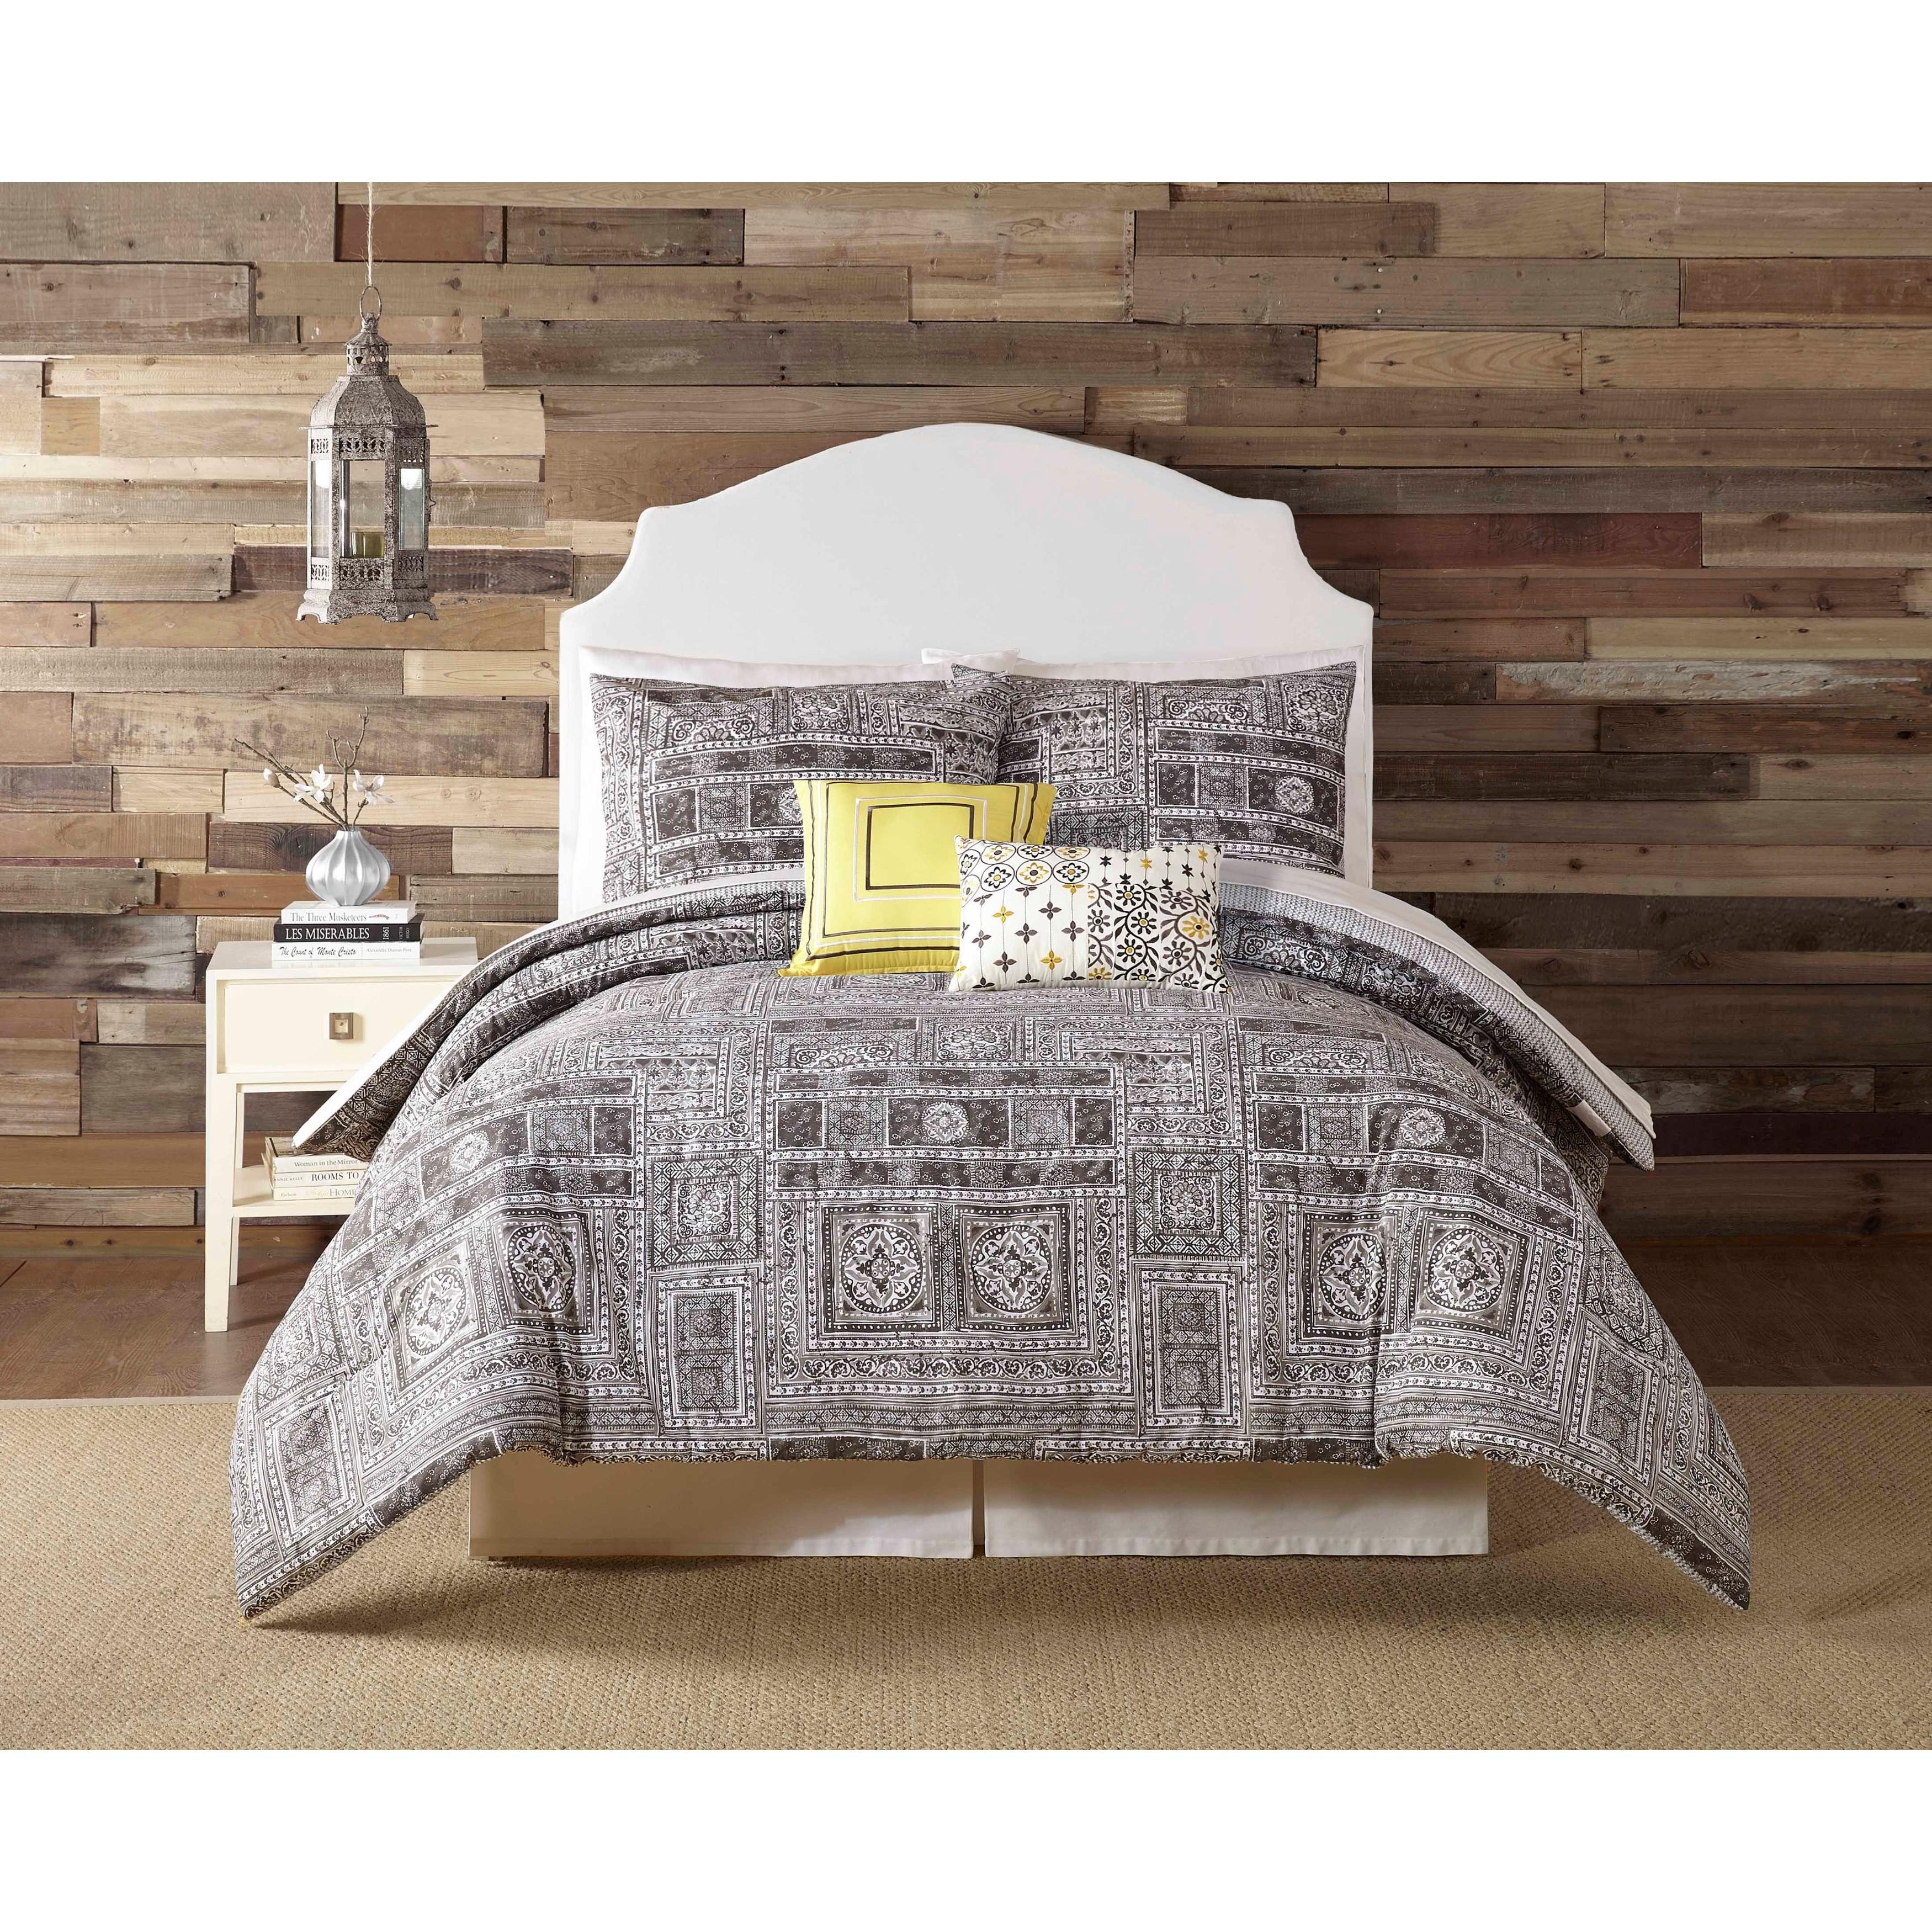 Indigo Bazaar Tranquility 5-piece Comforter Set (King), G...